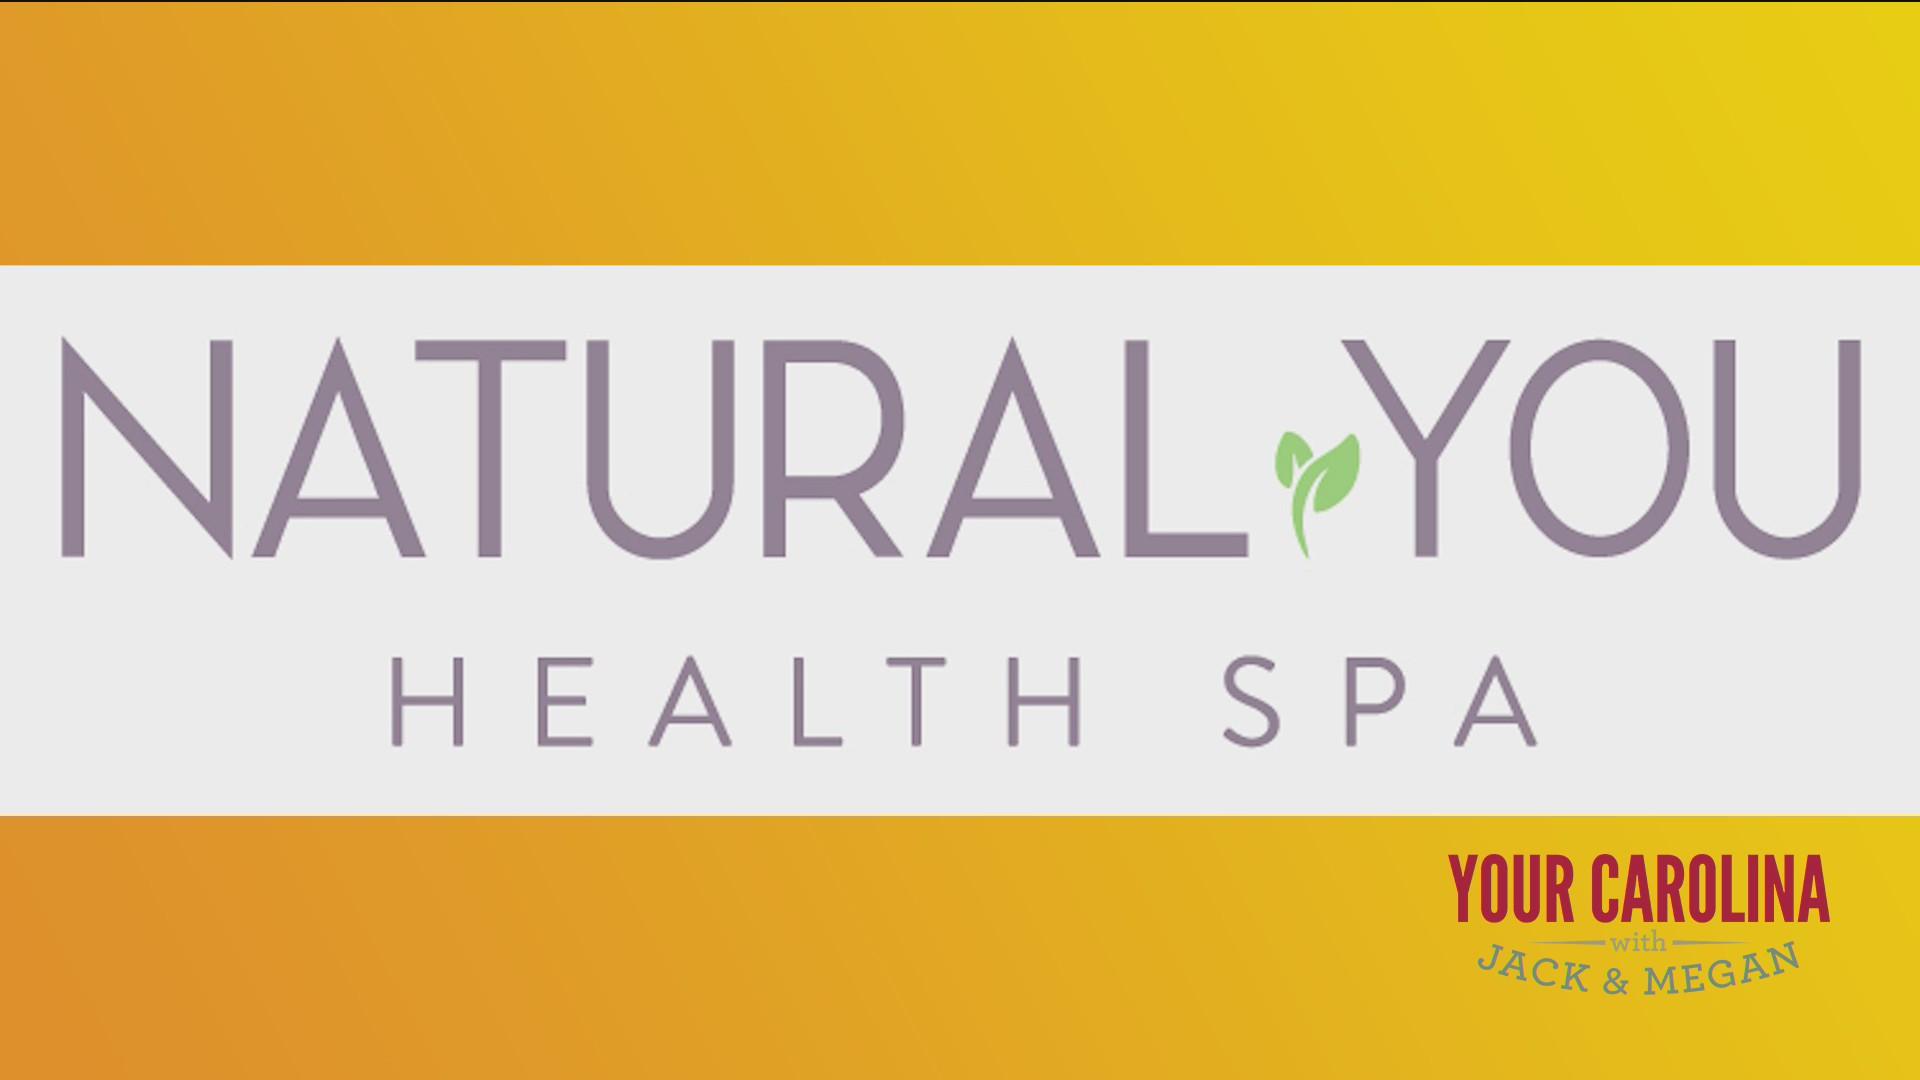 Natural You Health Spa